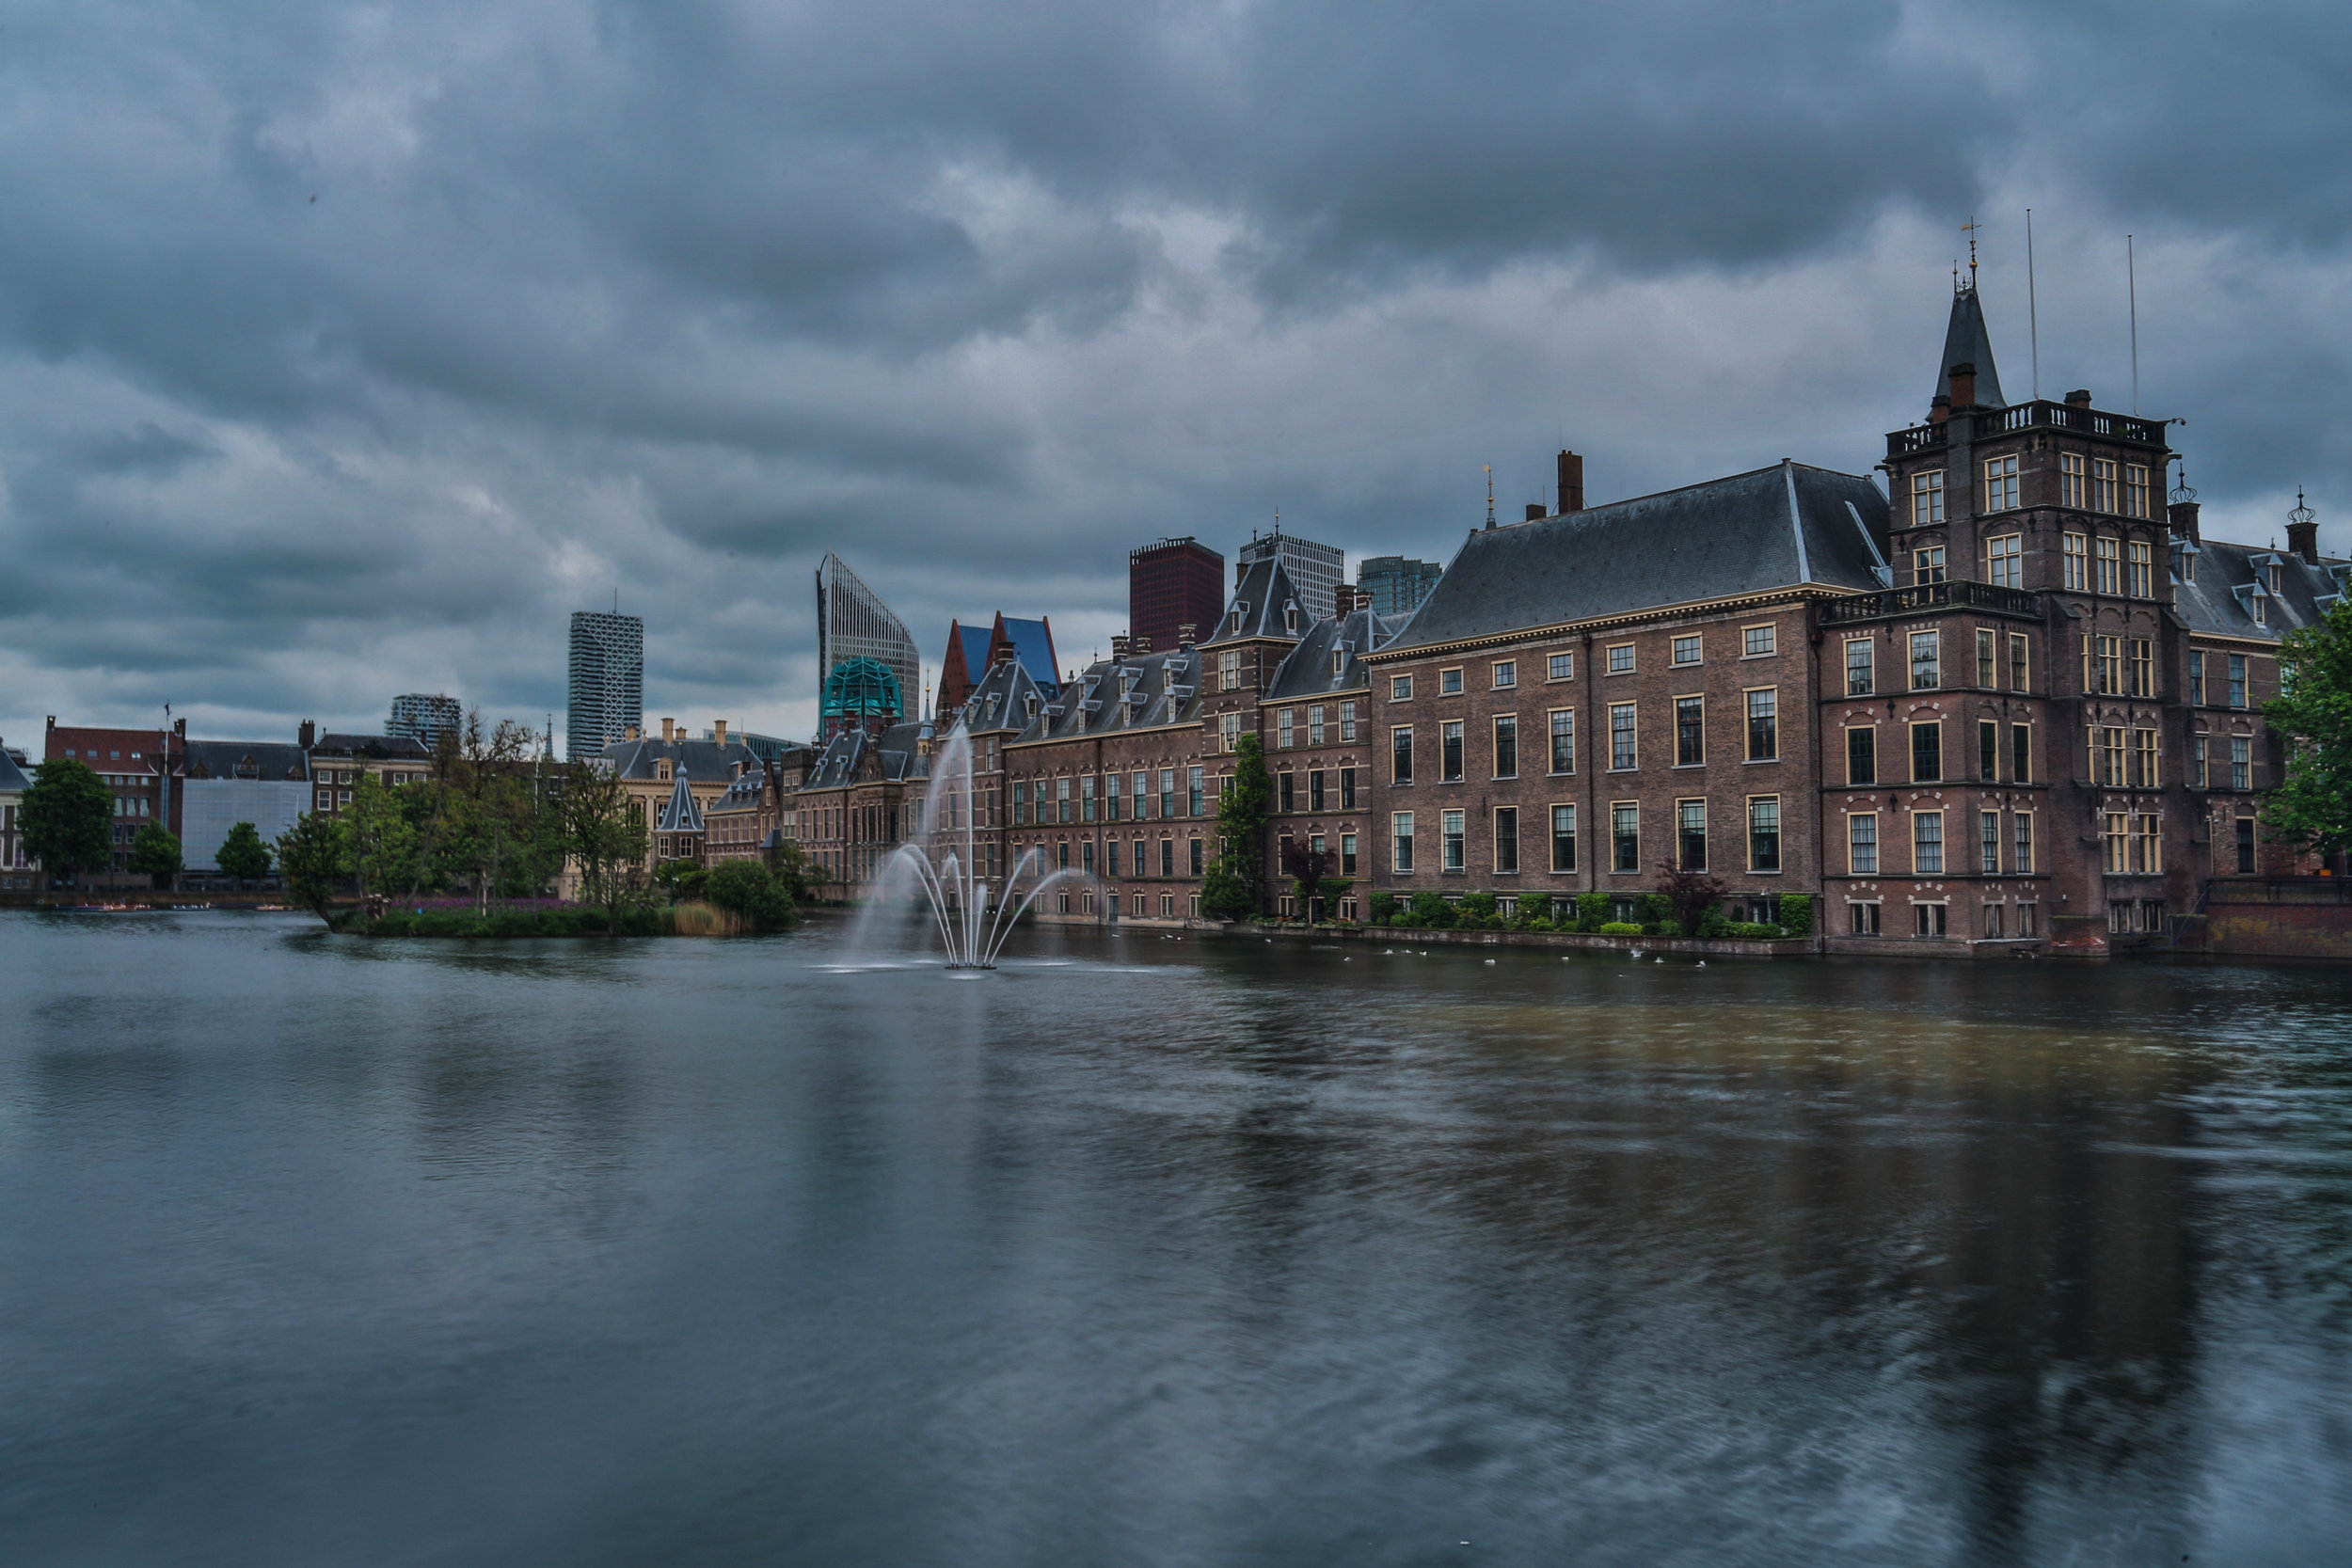 The Hague, Buitenhof